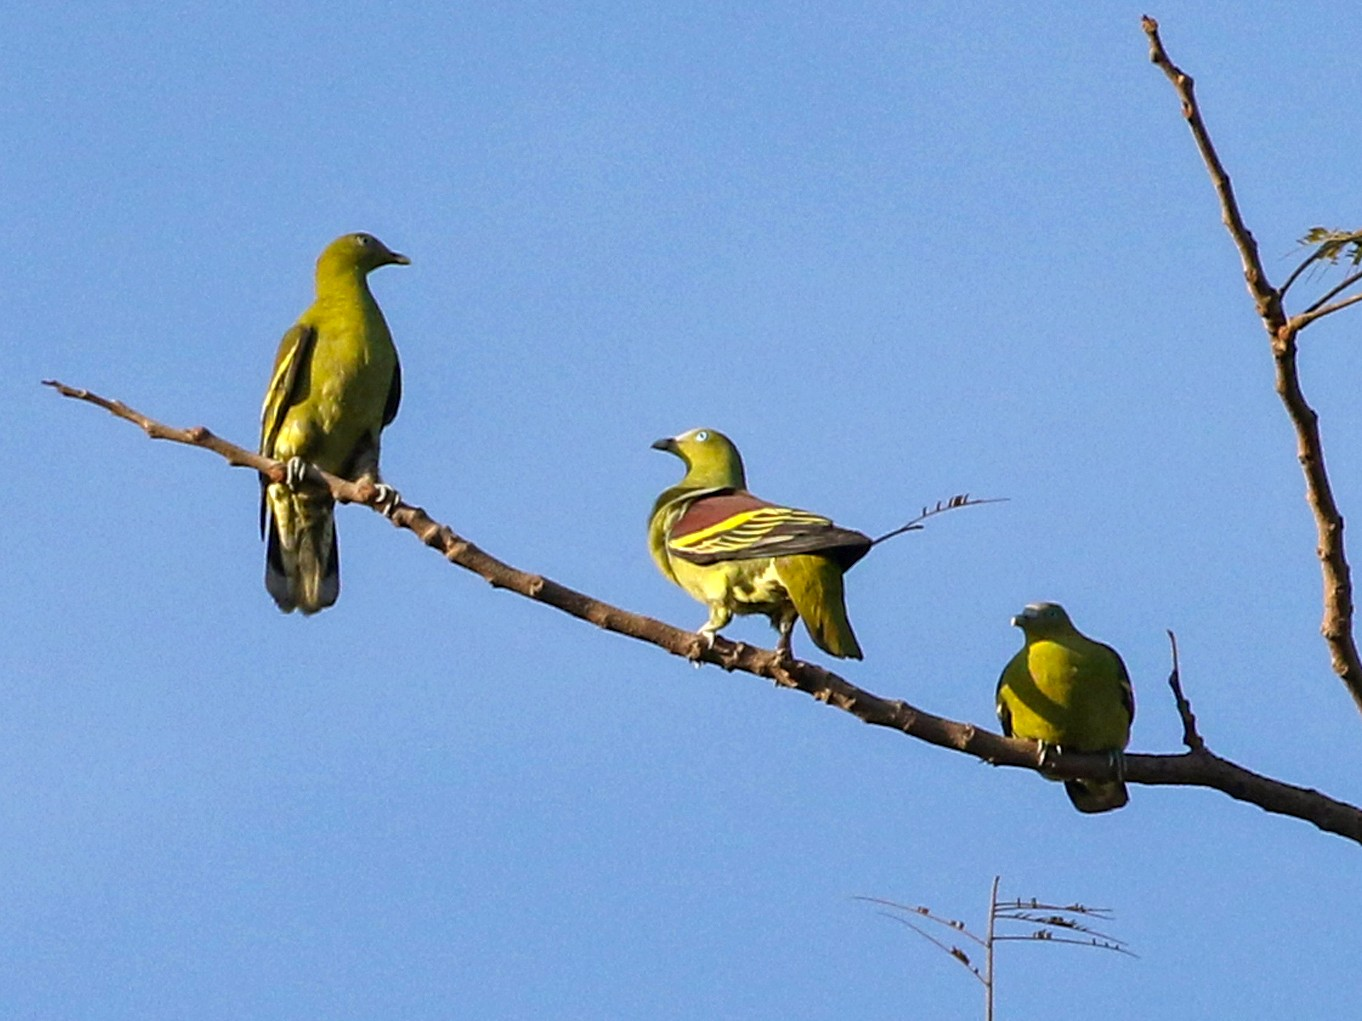 Philippine Green-Pigeon - Charley Hesse